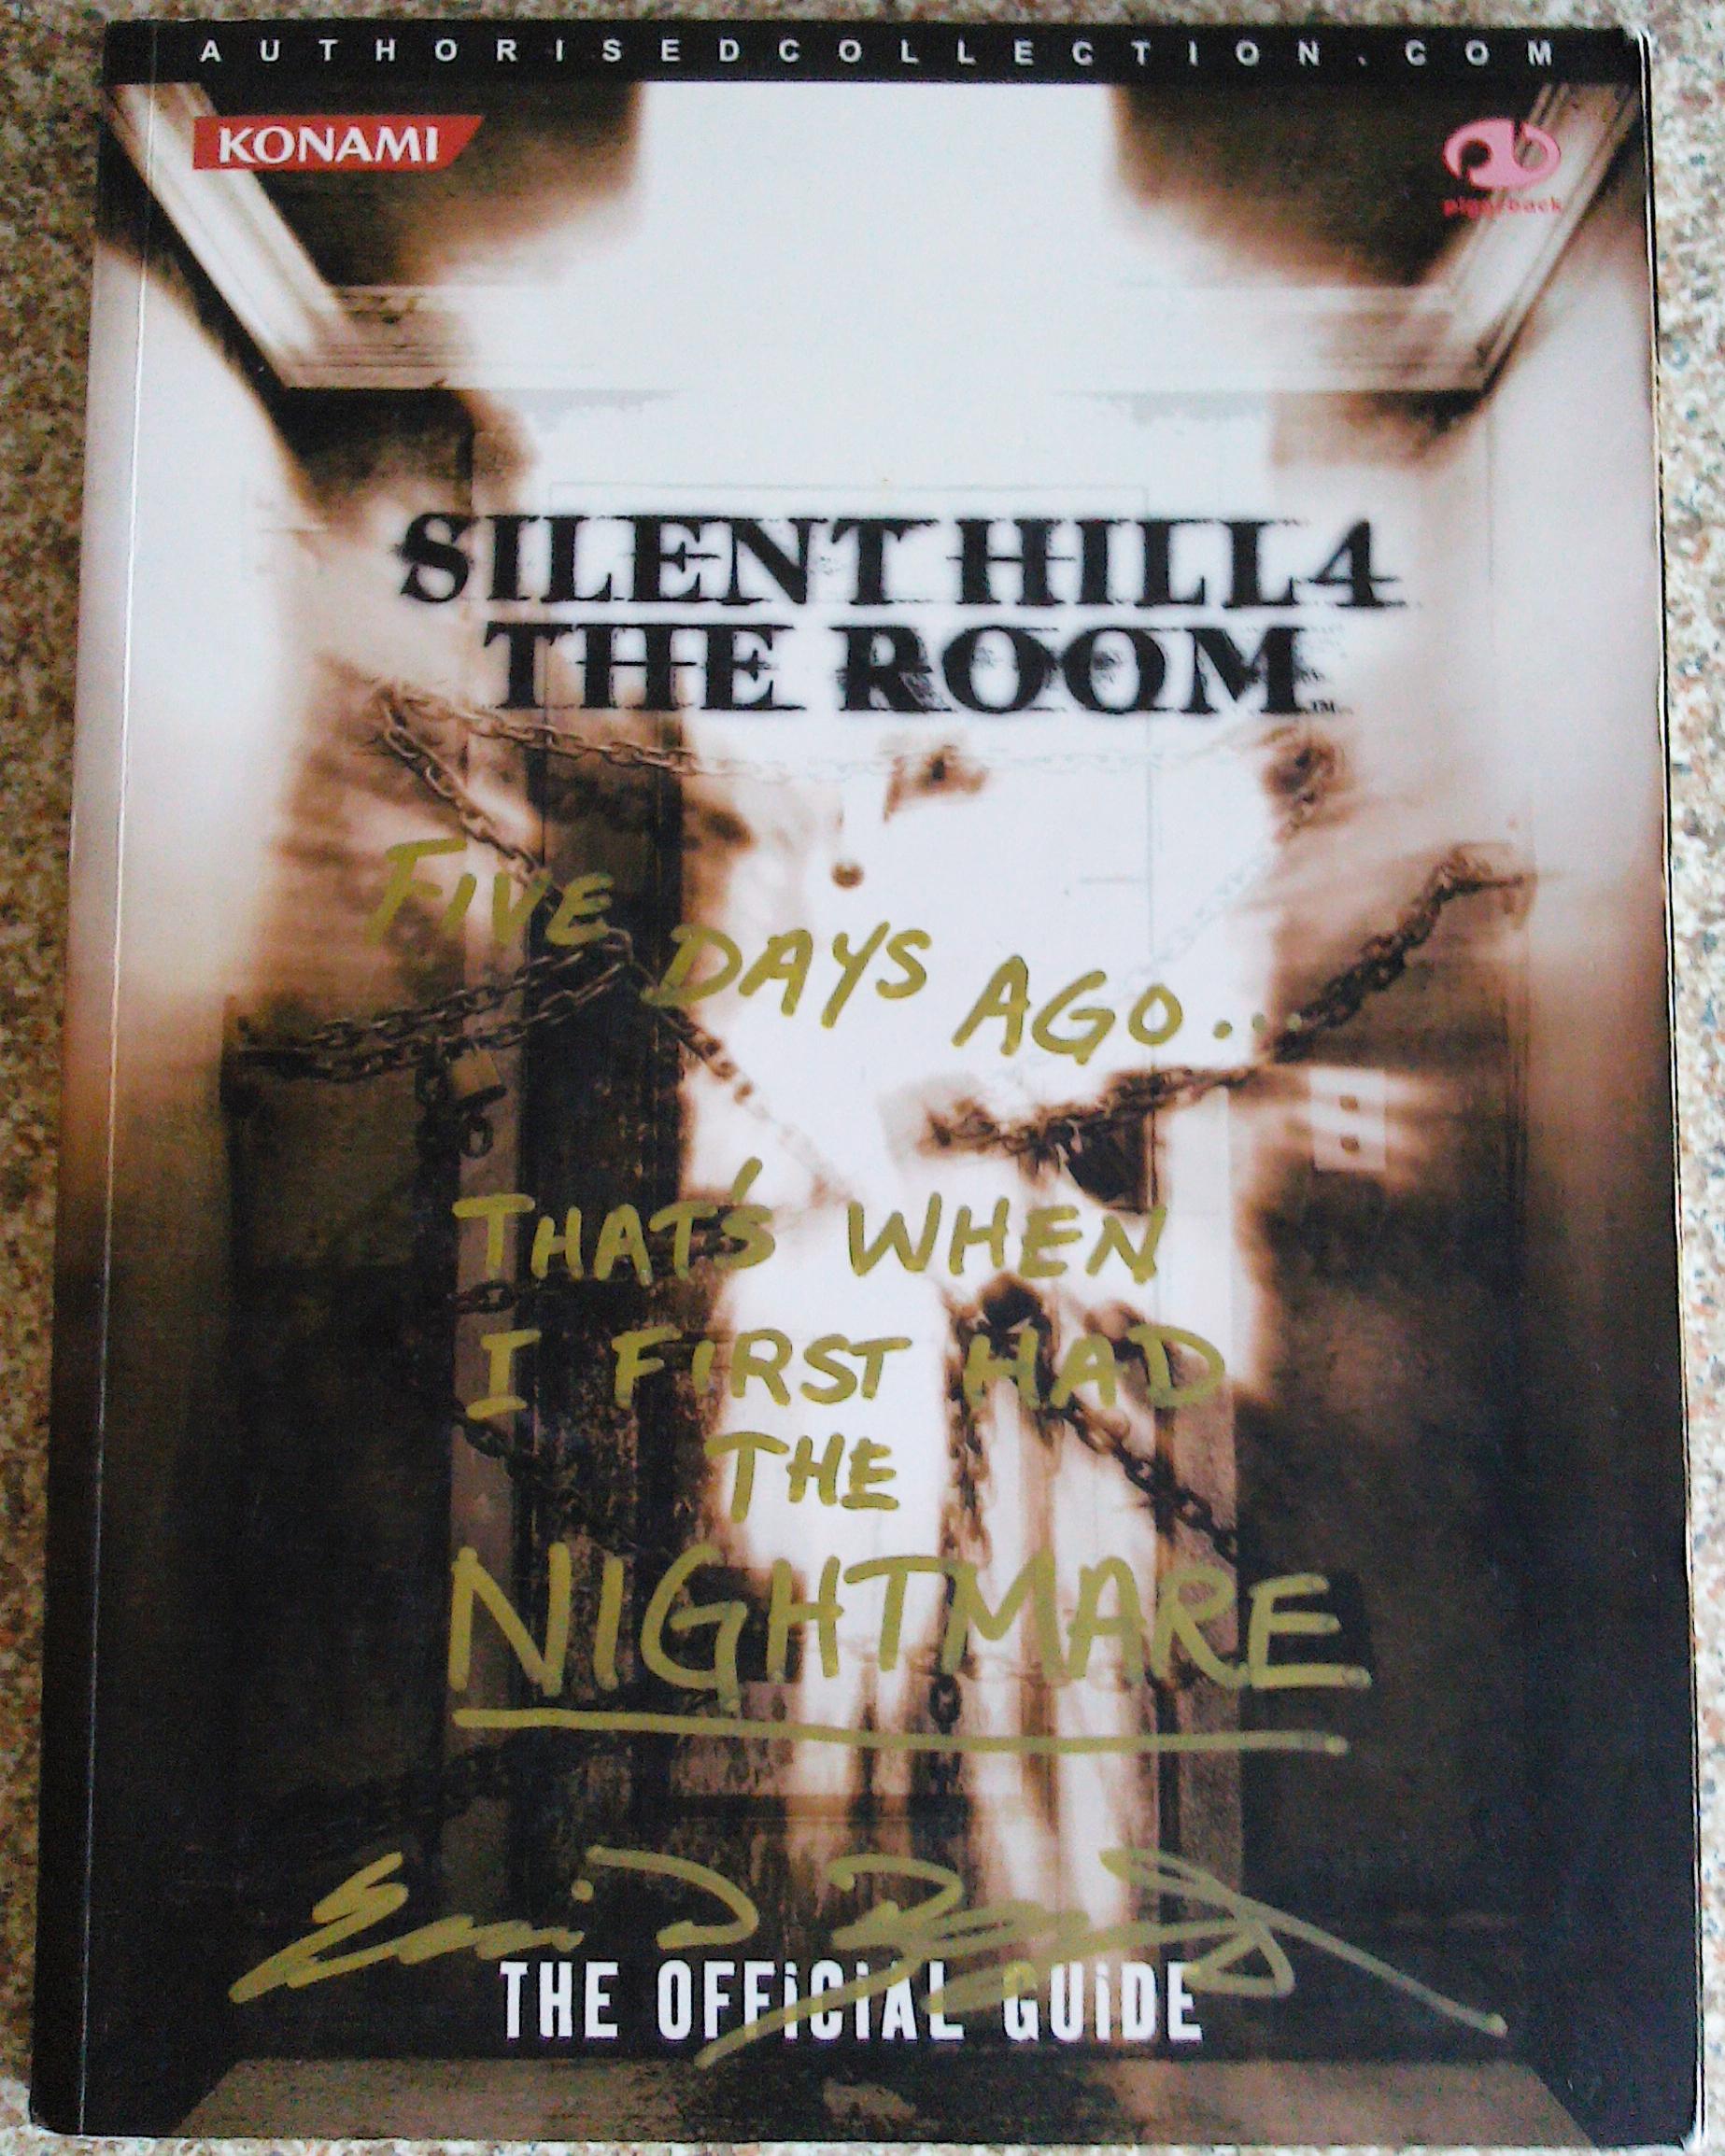 Silent Hill 4 - Eric Bossick